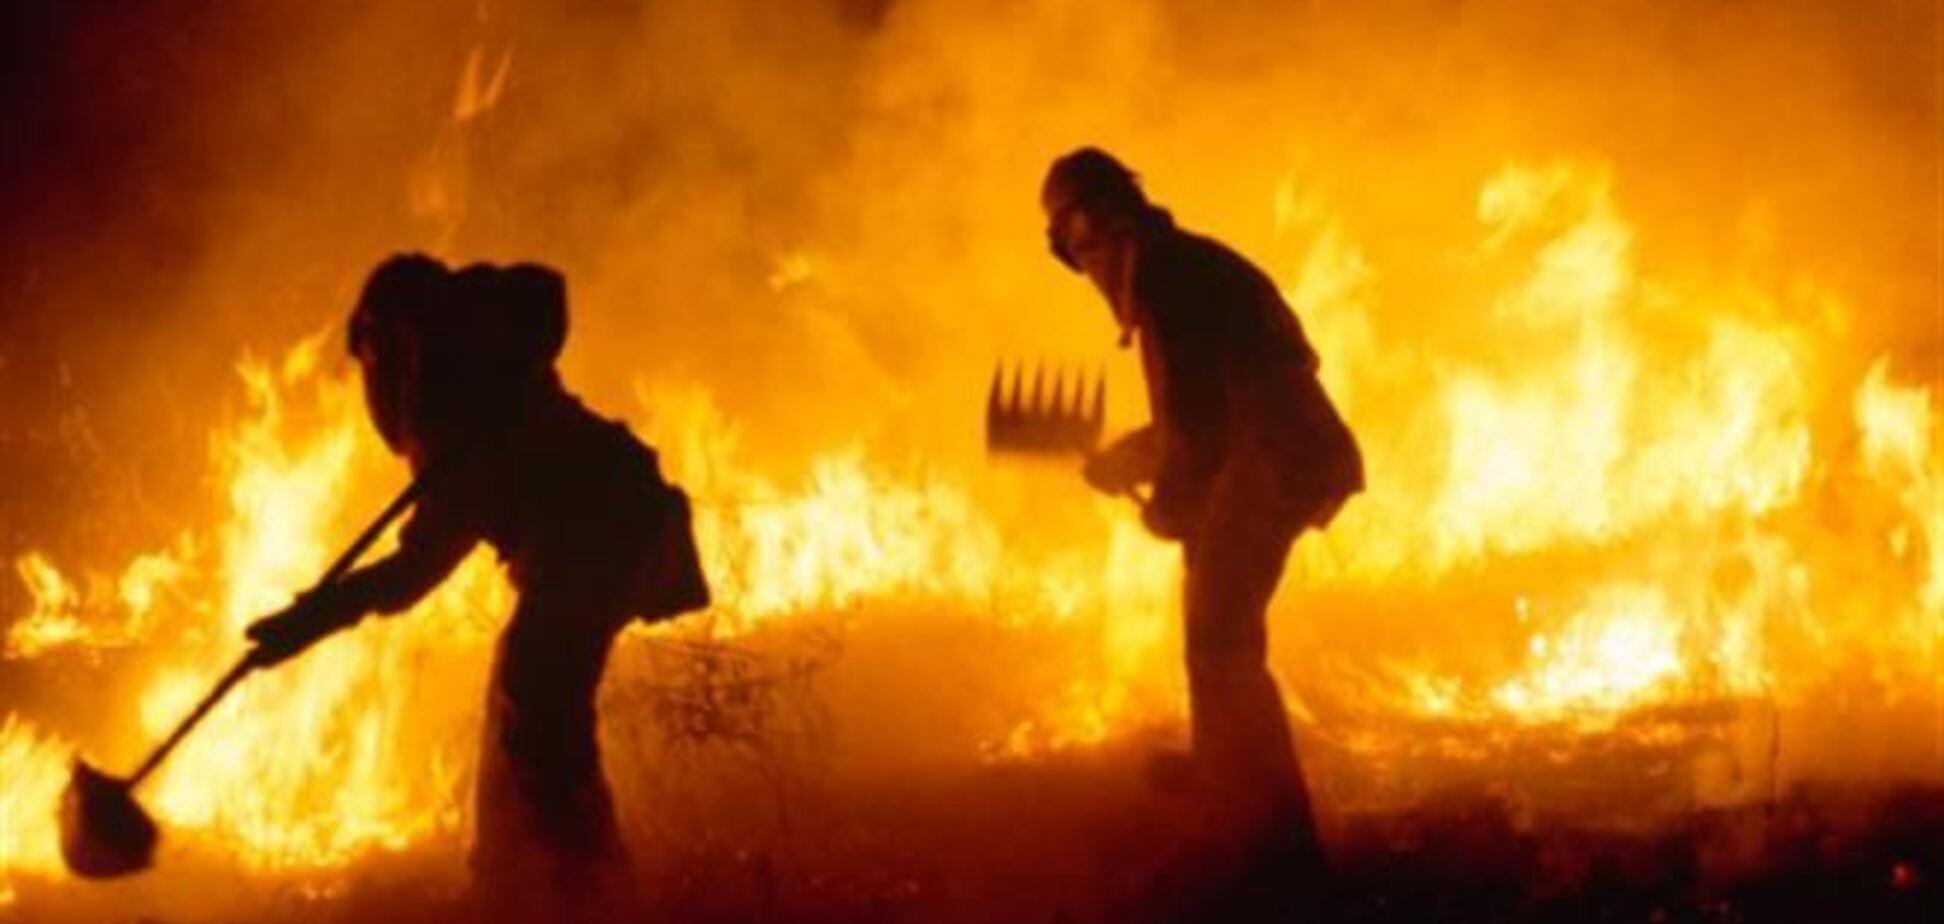 За минулу добу в Україні сталося 160 пожеж